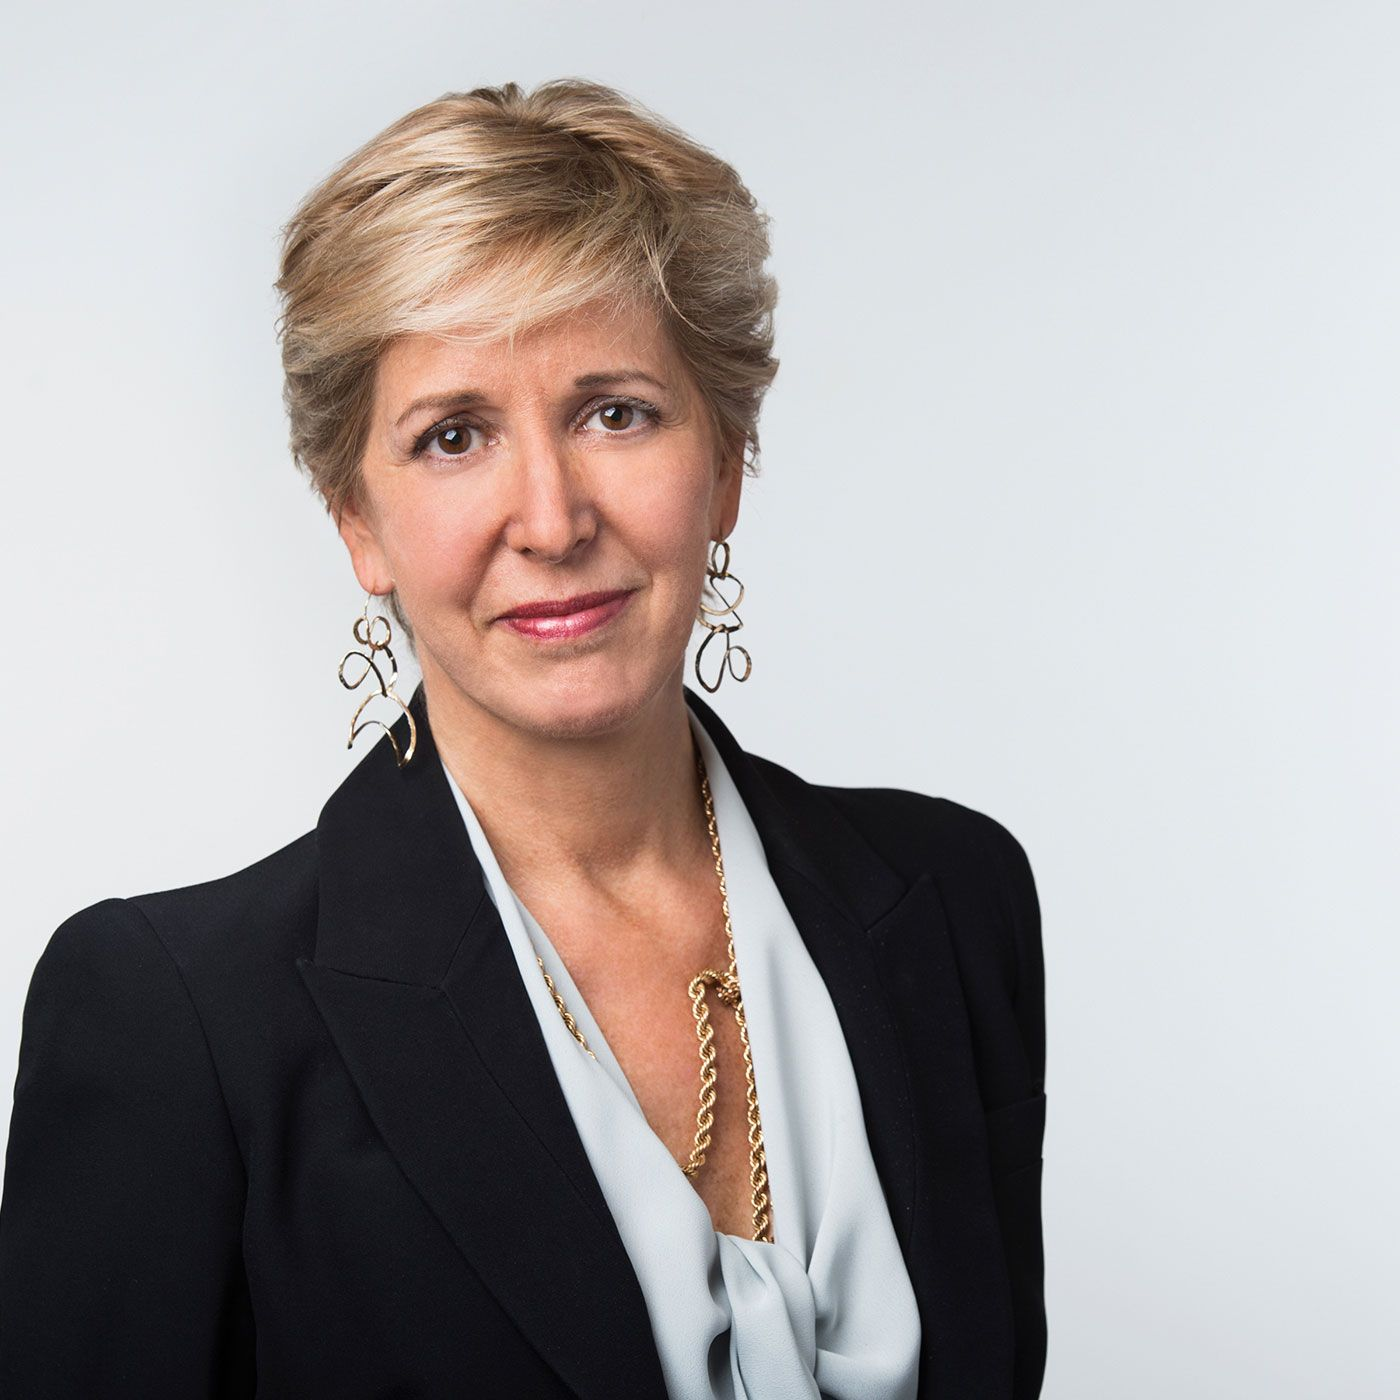 Danielle Pletka, Senior Foreign Policy Fellow, American Enterprise Institute